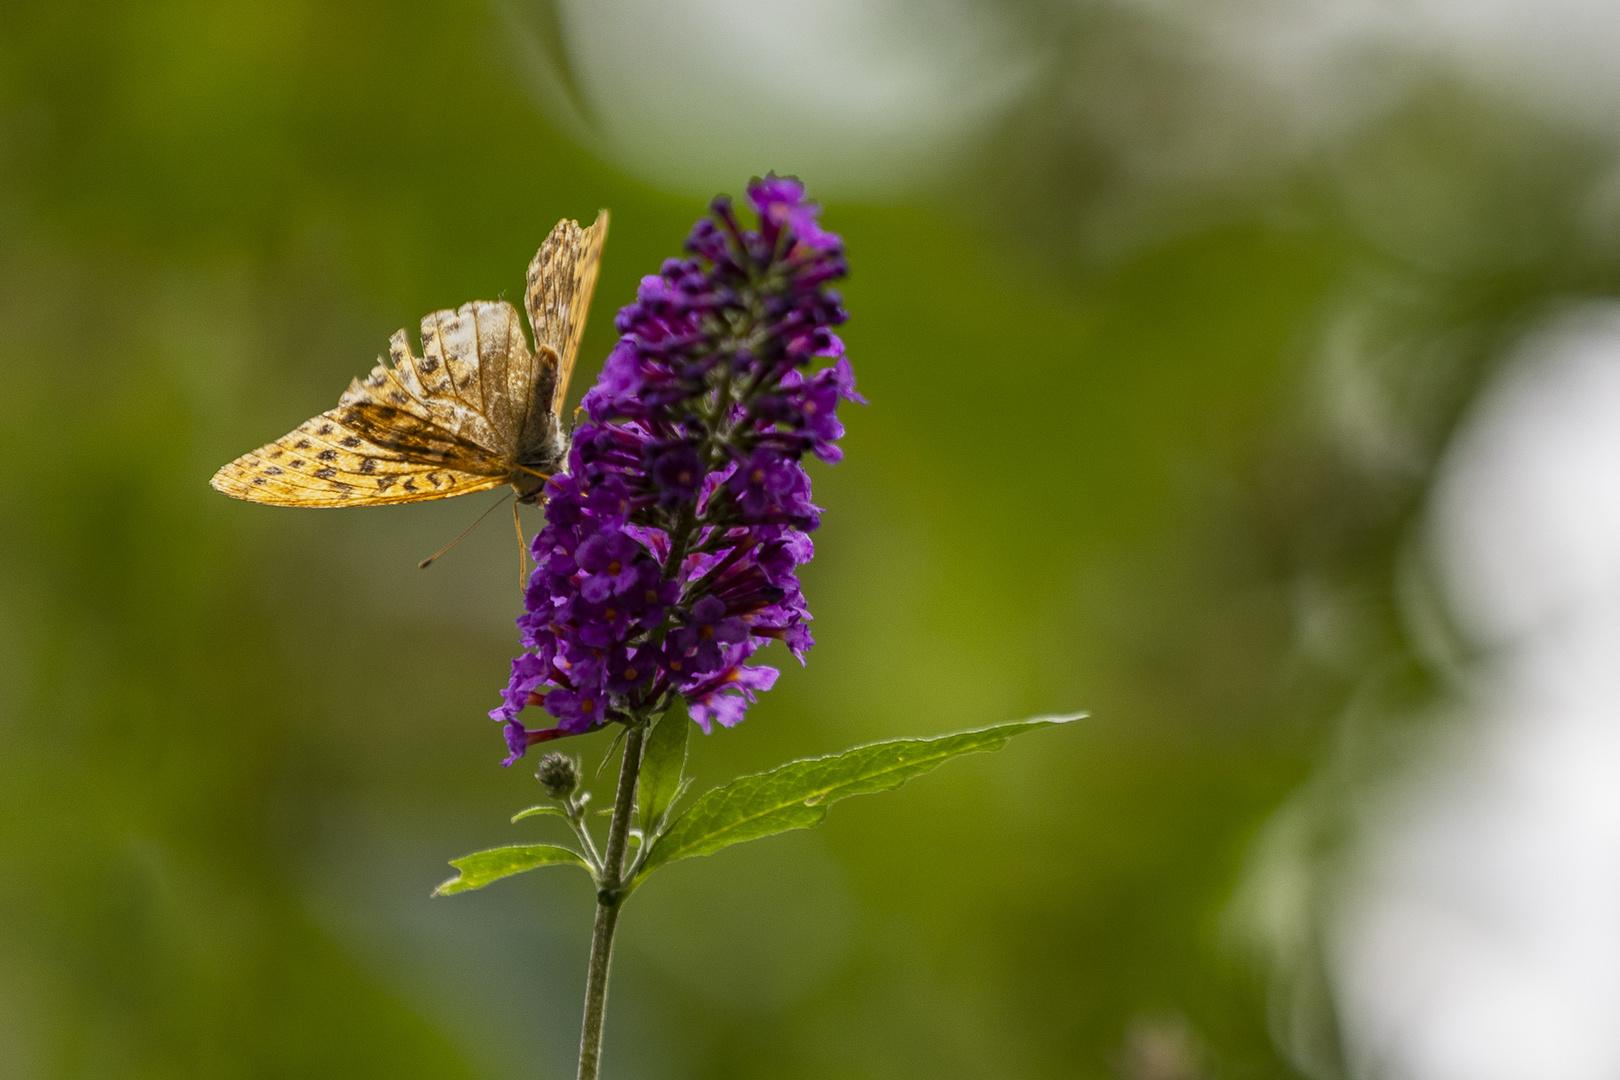 Schmetterling auf Schmetterlings-Flieder